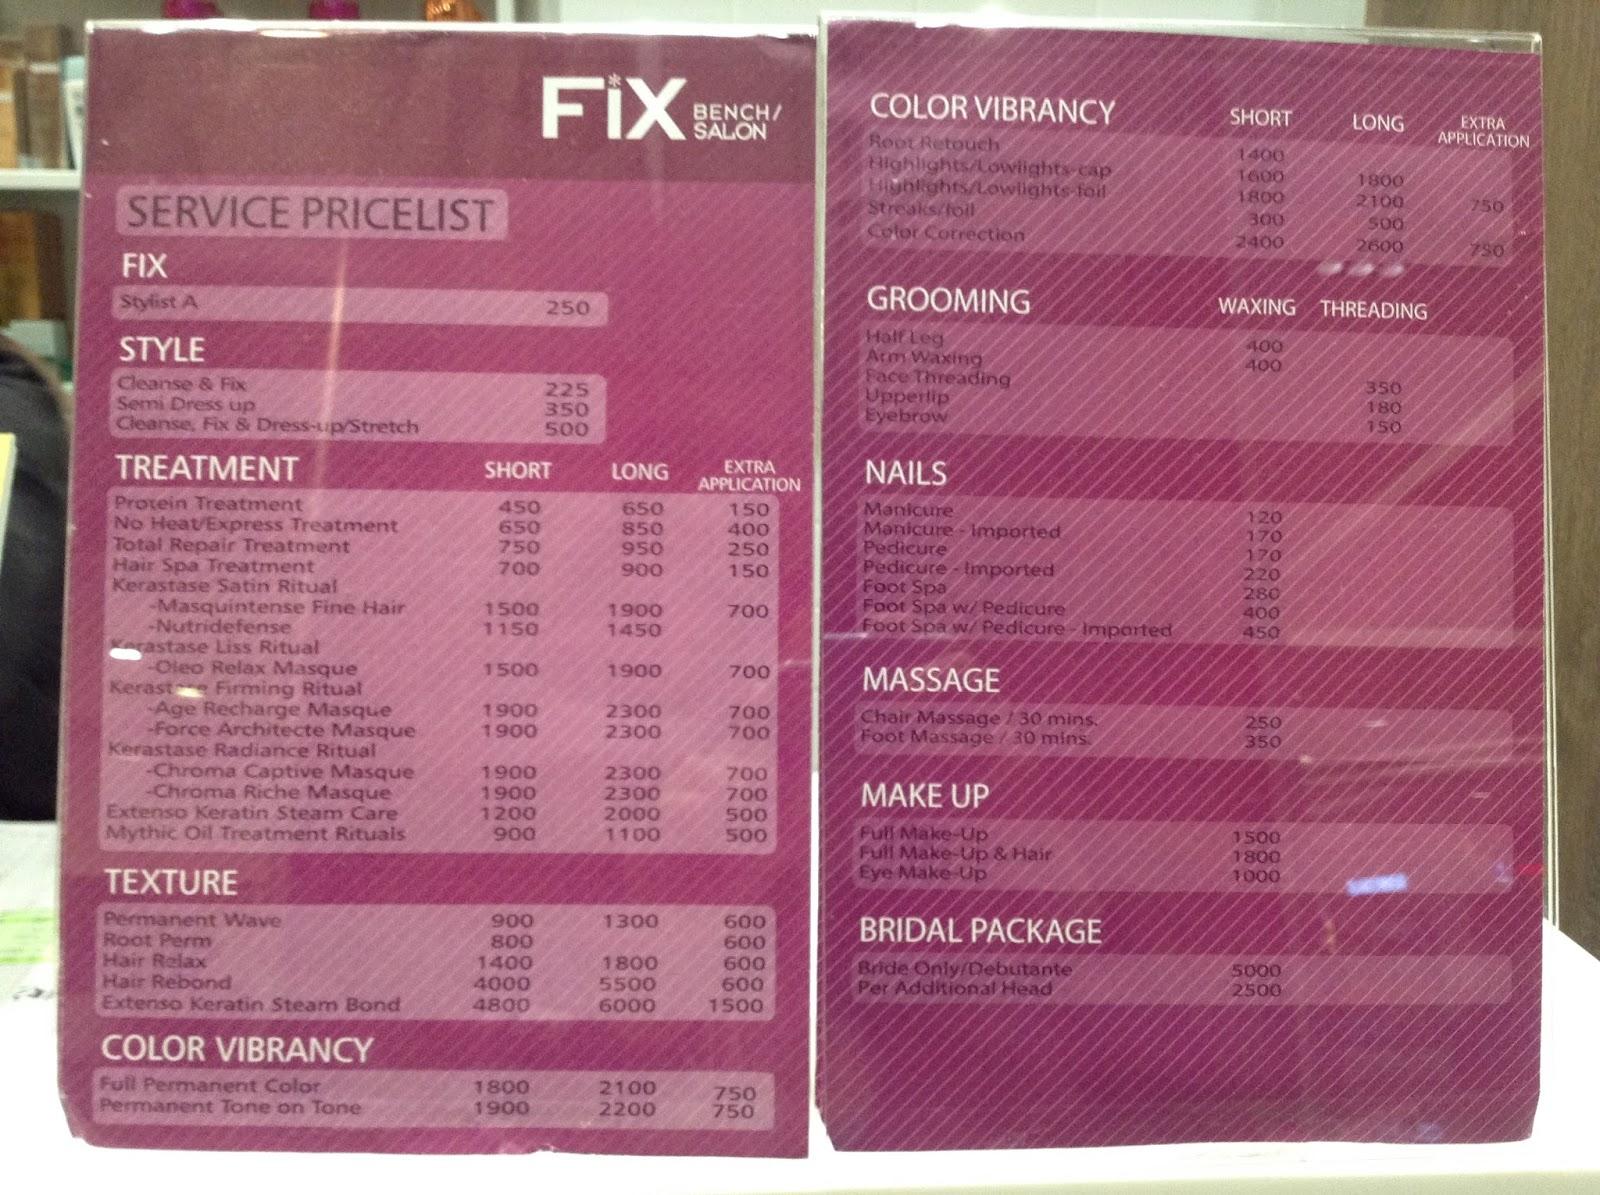 FIX  Bench  Salon at SM San Lazaro Branch The Foodinista